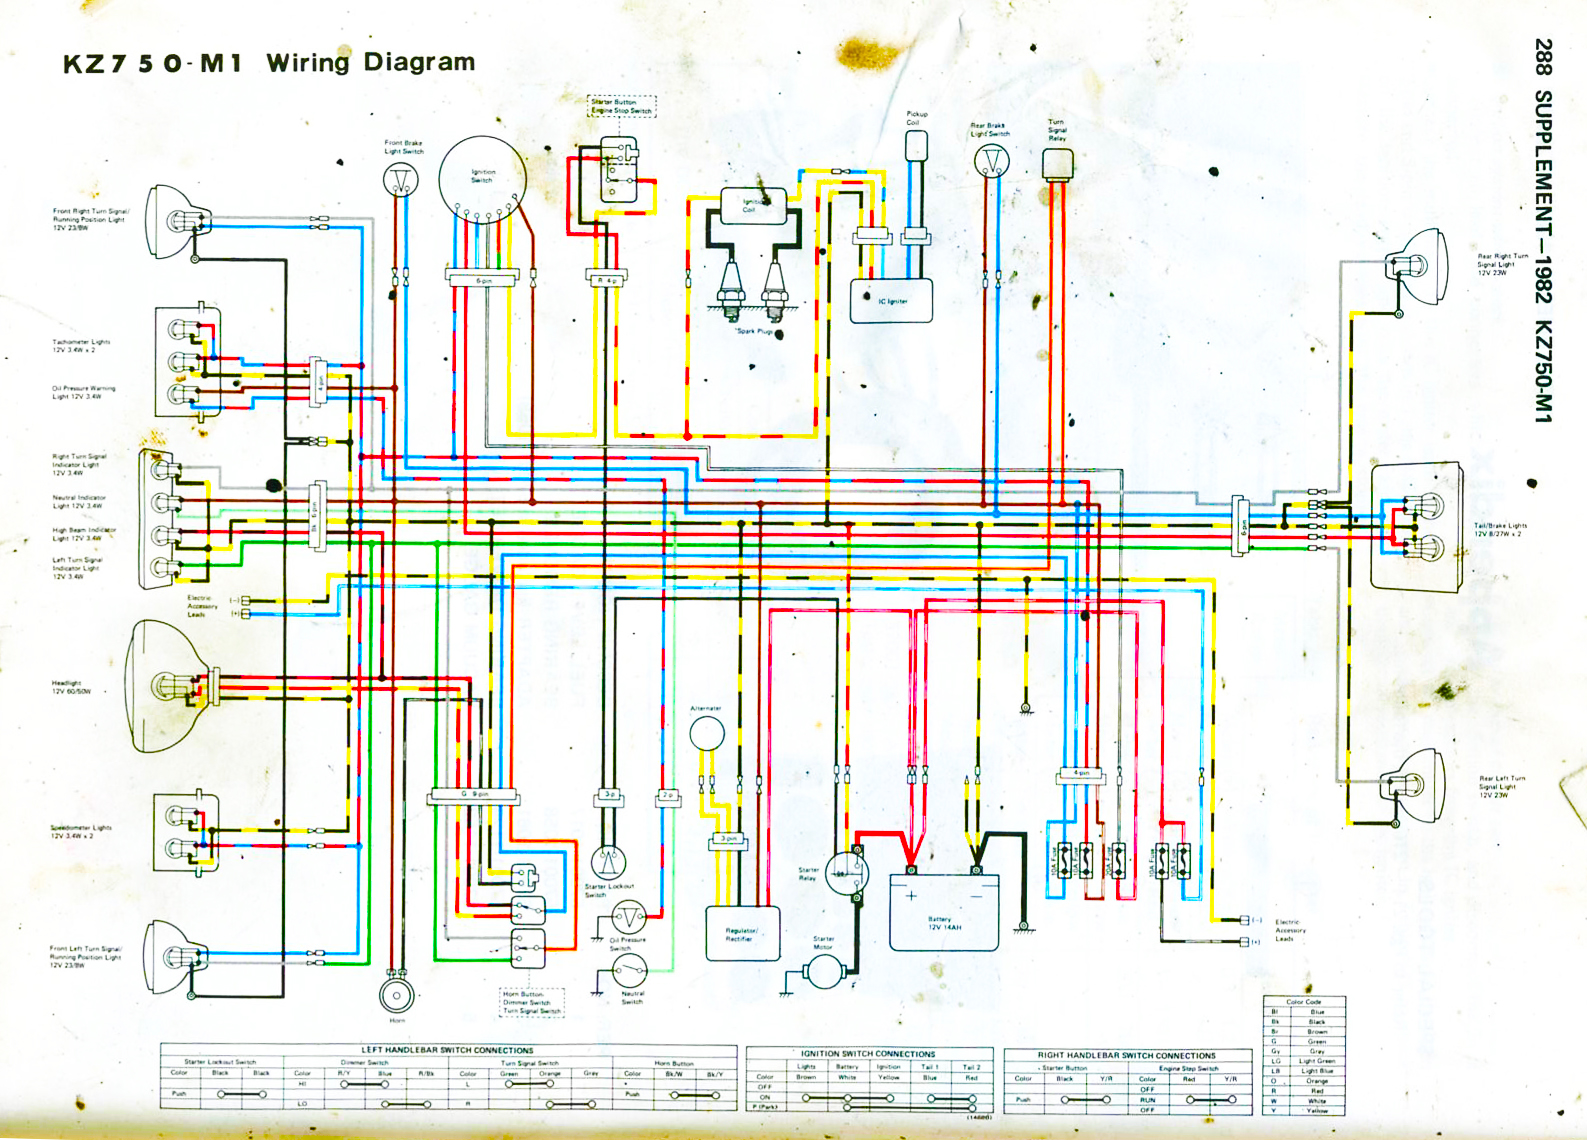 ➤ diagram wiring diagram kz750 ltd Kawasaki Ninja ZX-14 1980 K Z 750 Wiring Diagram #20